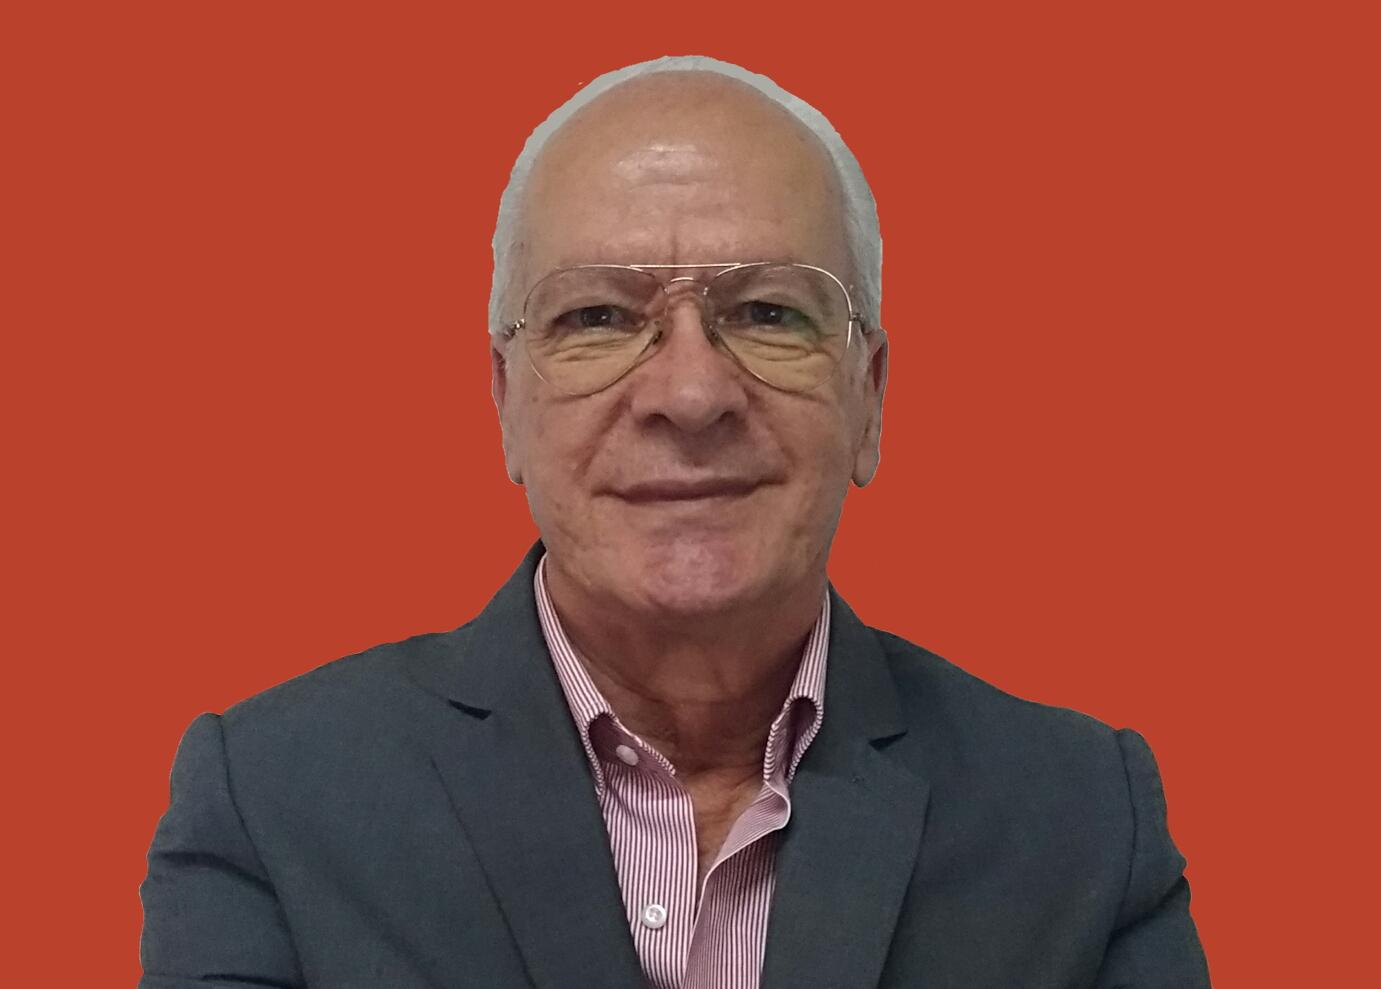 Dott. Antonio Pedone